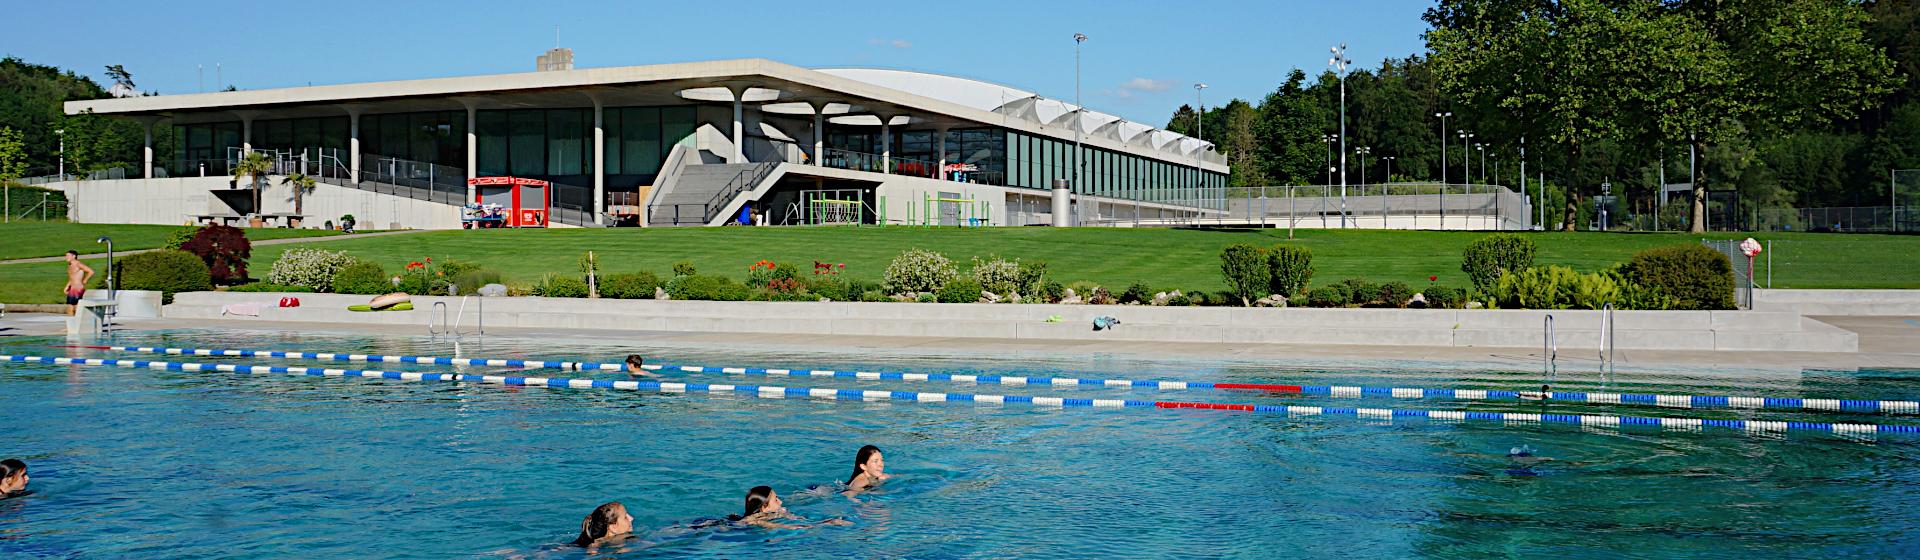 Sportzentrum Effretikon im Sommer